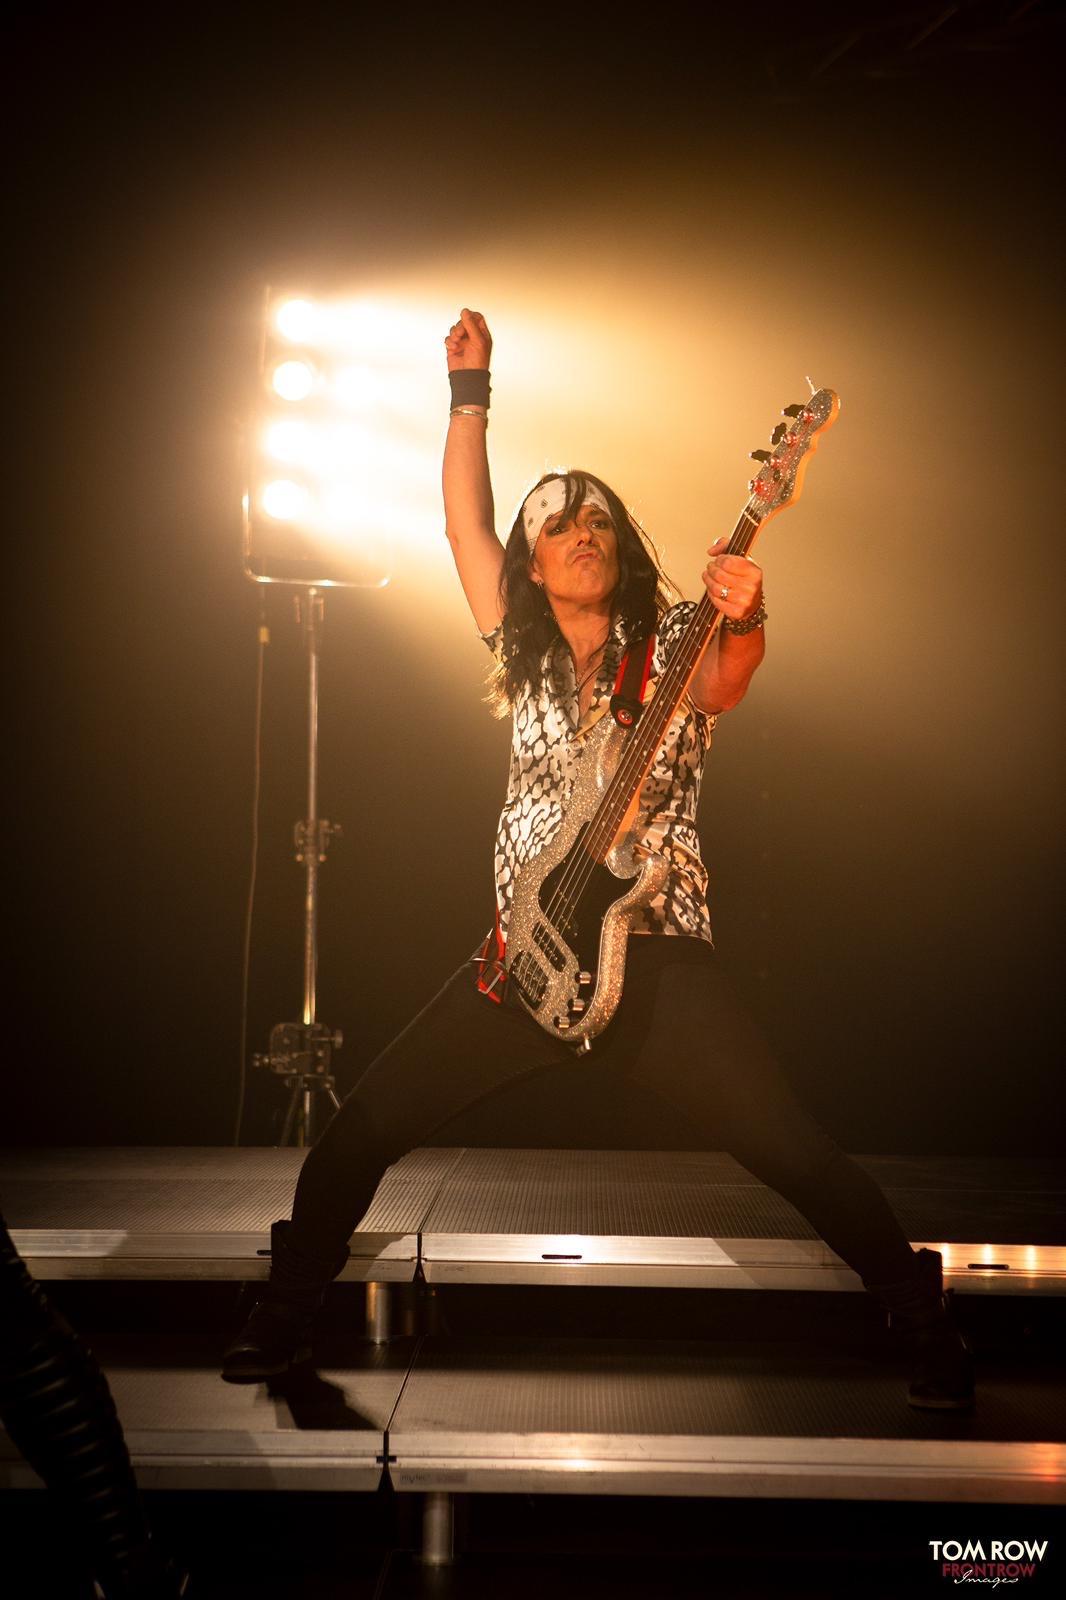 John Diva & the Rocket of Love Videodreh Bühnentechnik